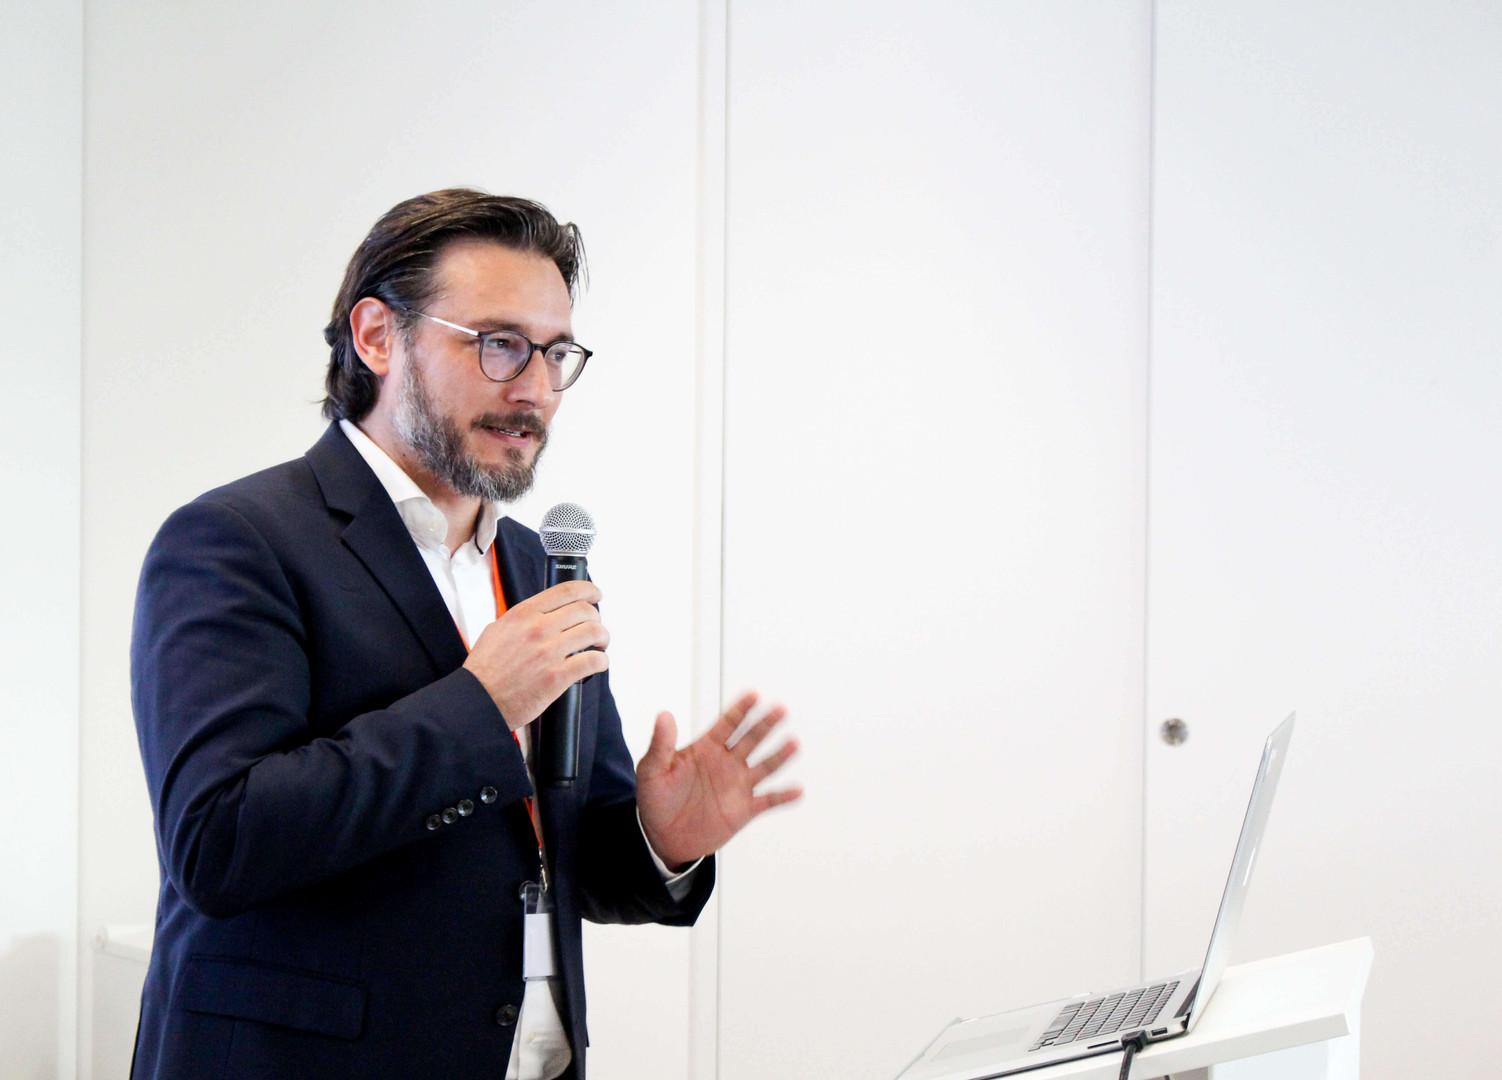 PROF. DR.- ING. SAMI HADDADIN   Direktor der Munich School of Robotics